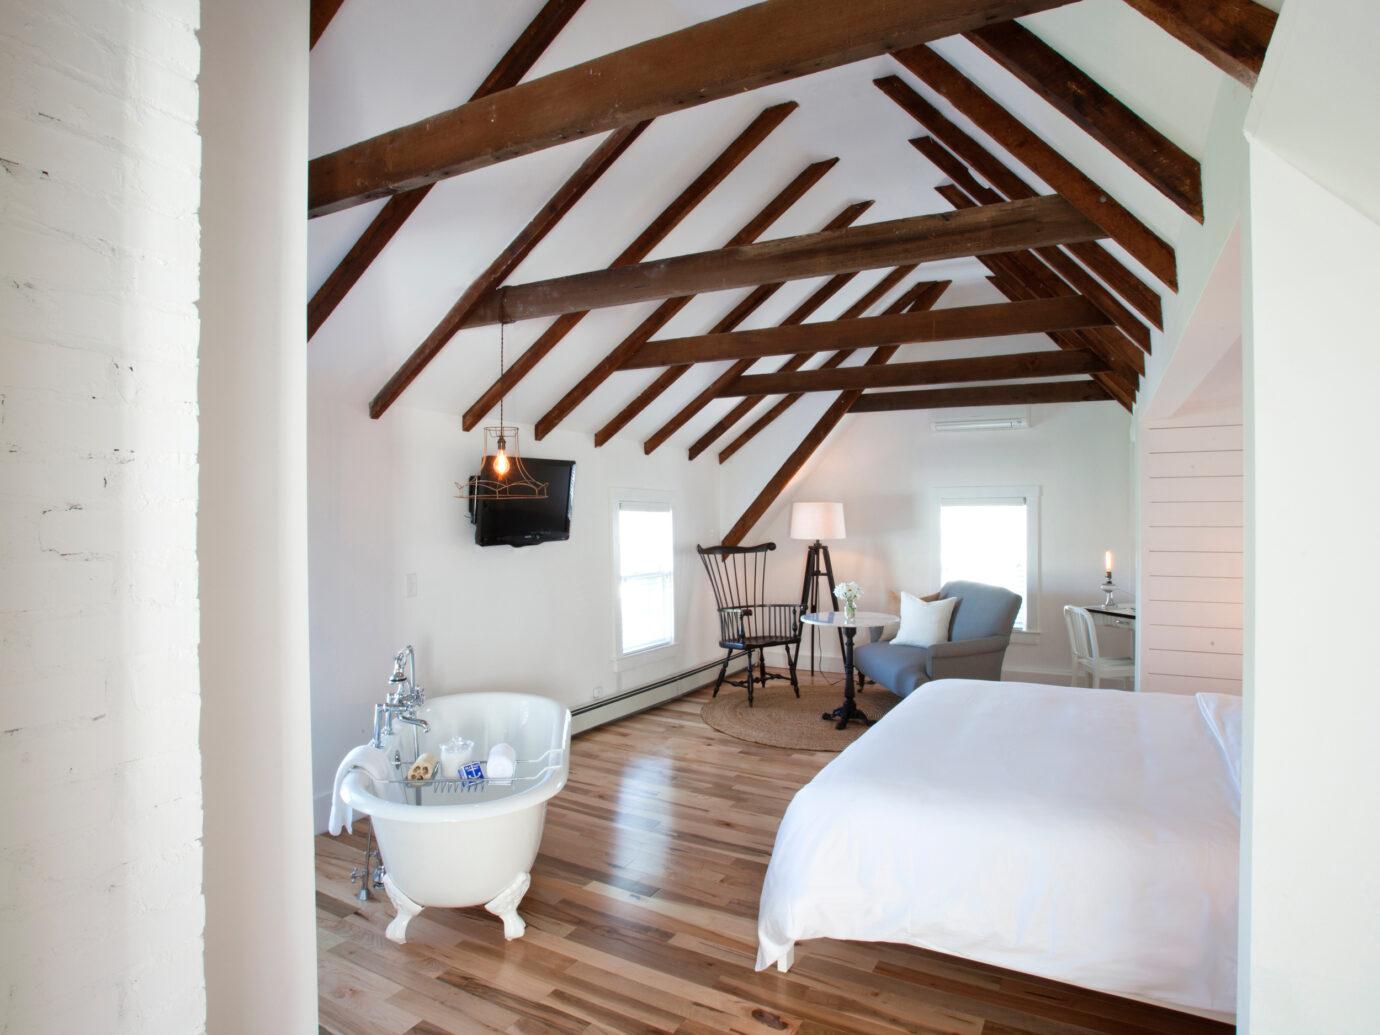 Loft at Salt House Inn, Provincetown, MA